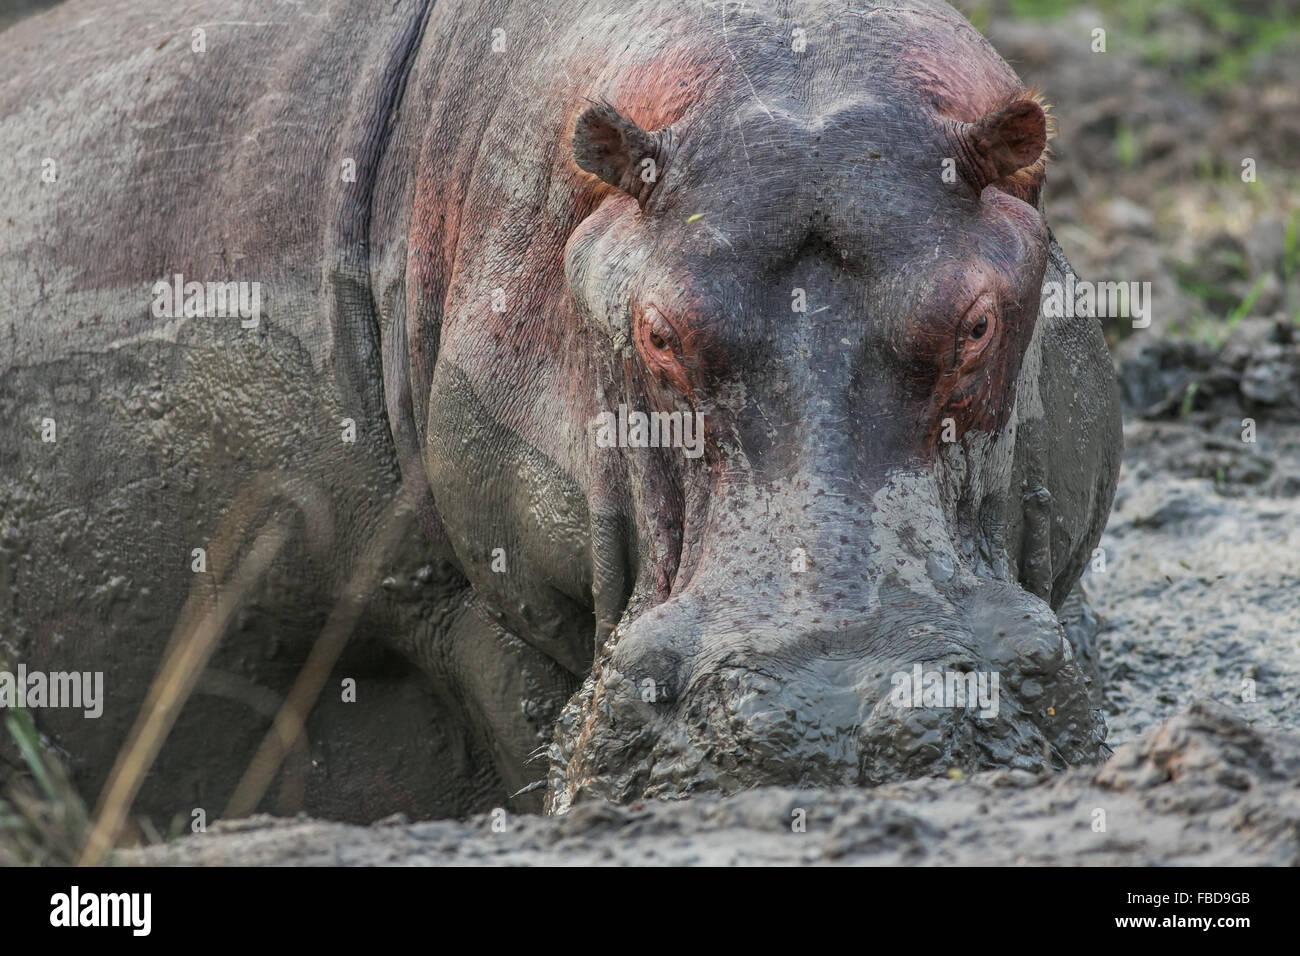 A large adult hippopotamus (Hippopotamus amphibius) wallowing in a mud pool, South Luangwa National Park, Zambia, - Stock Image